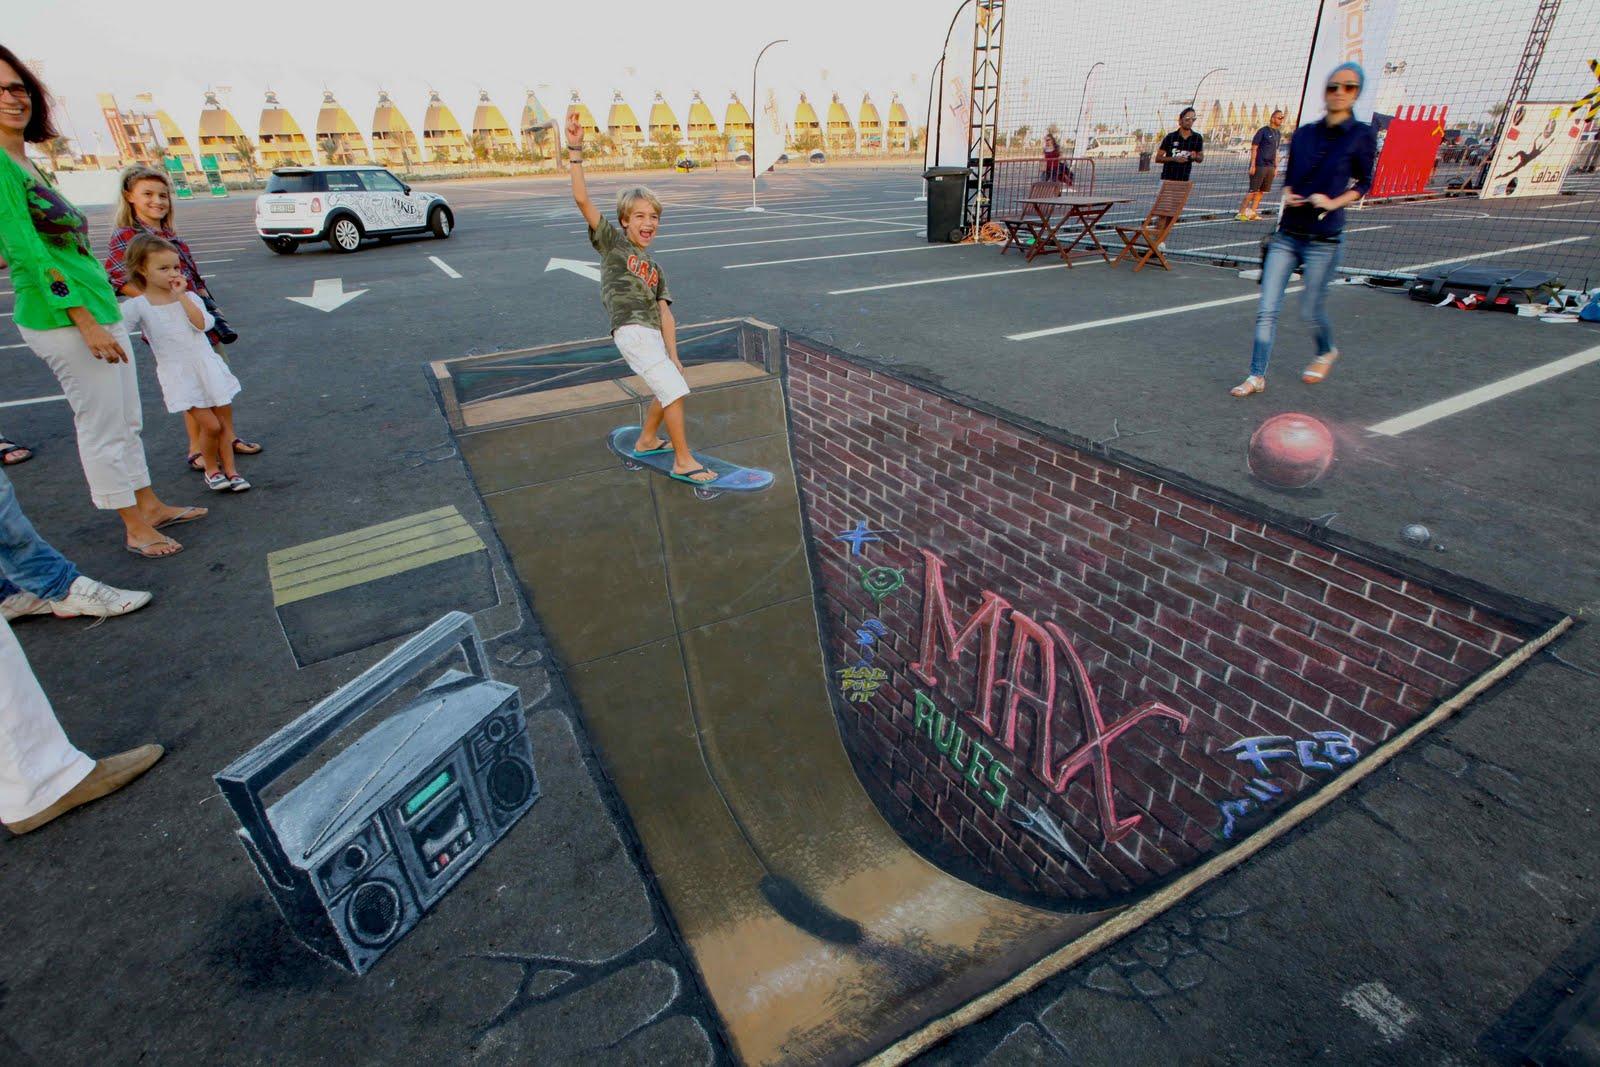 Drawn optical illusion pavement 3d 2 Art Art